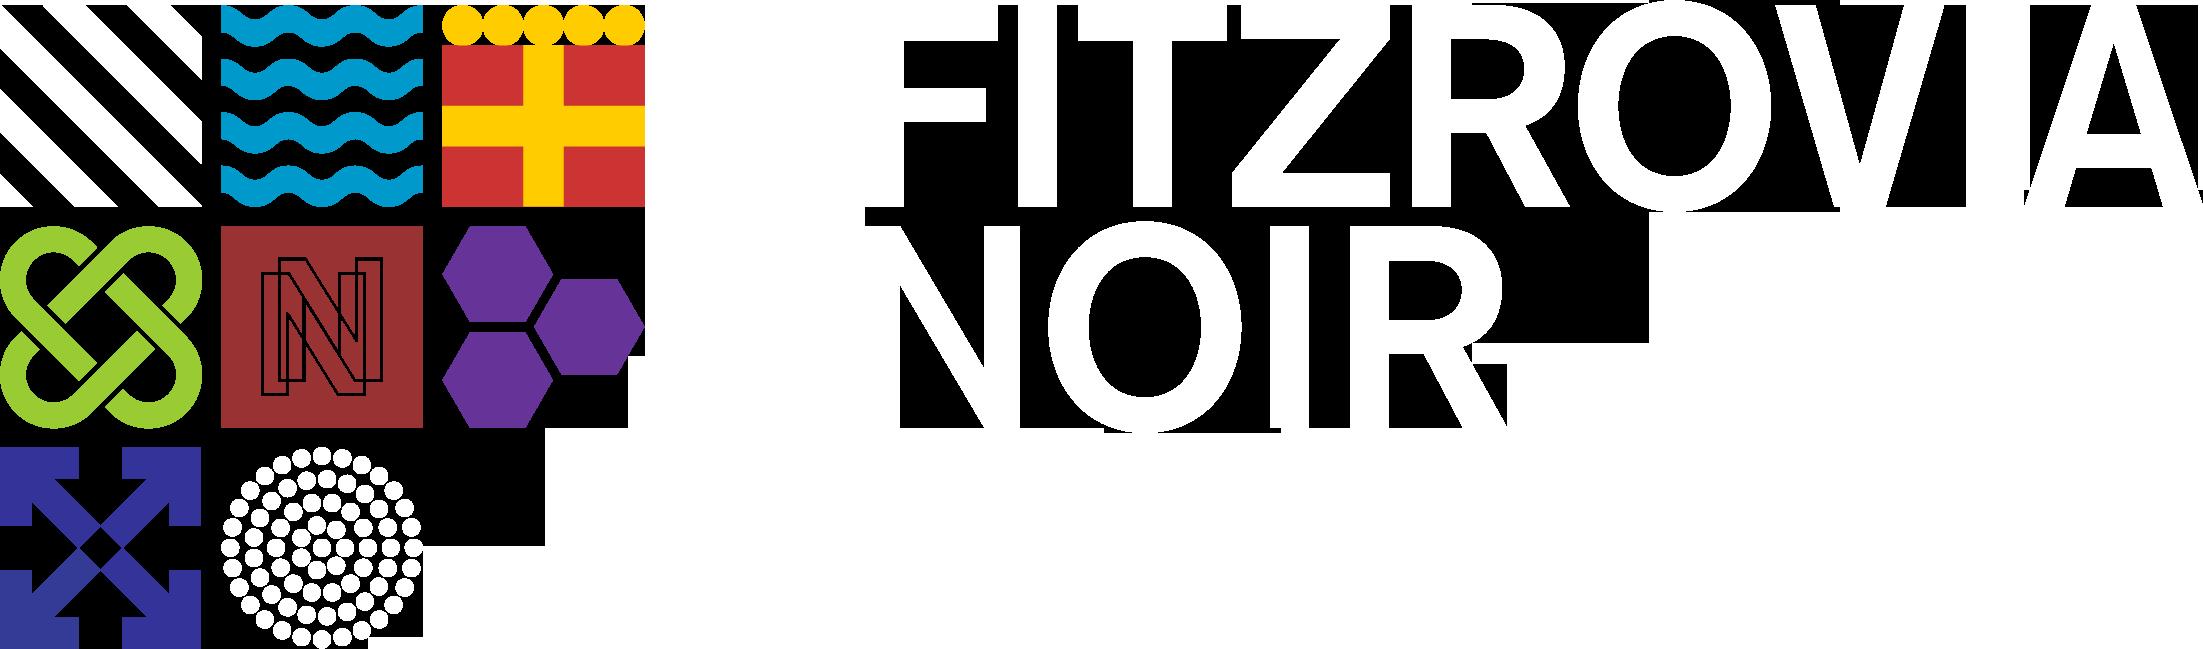 Fitzrovia Noir Logo